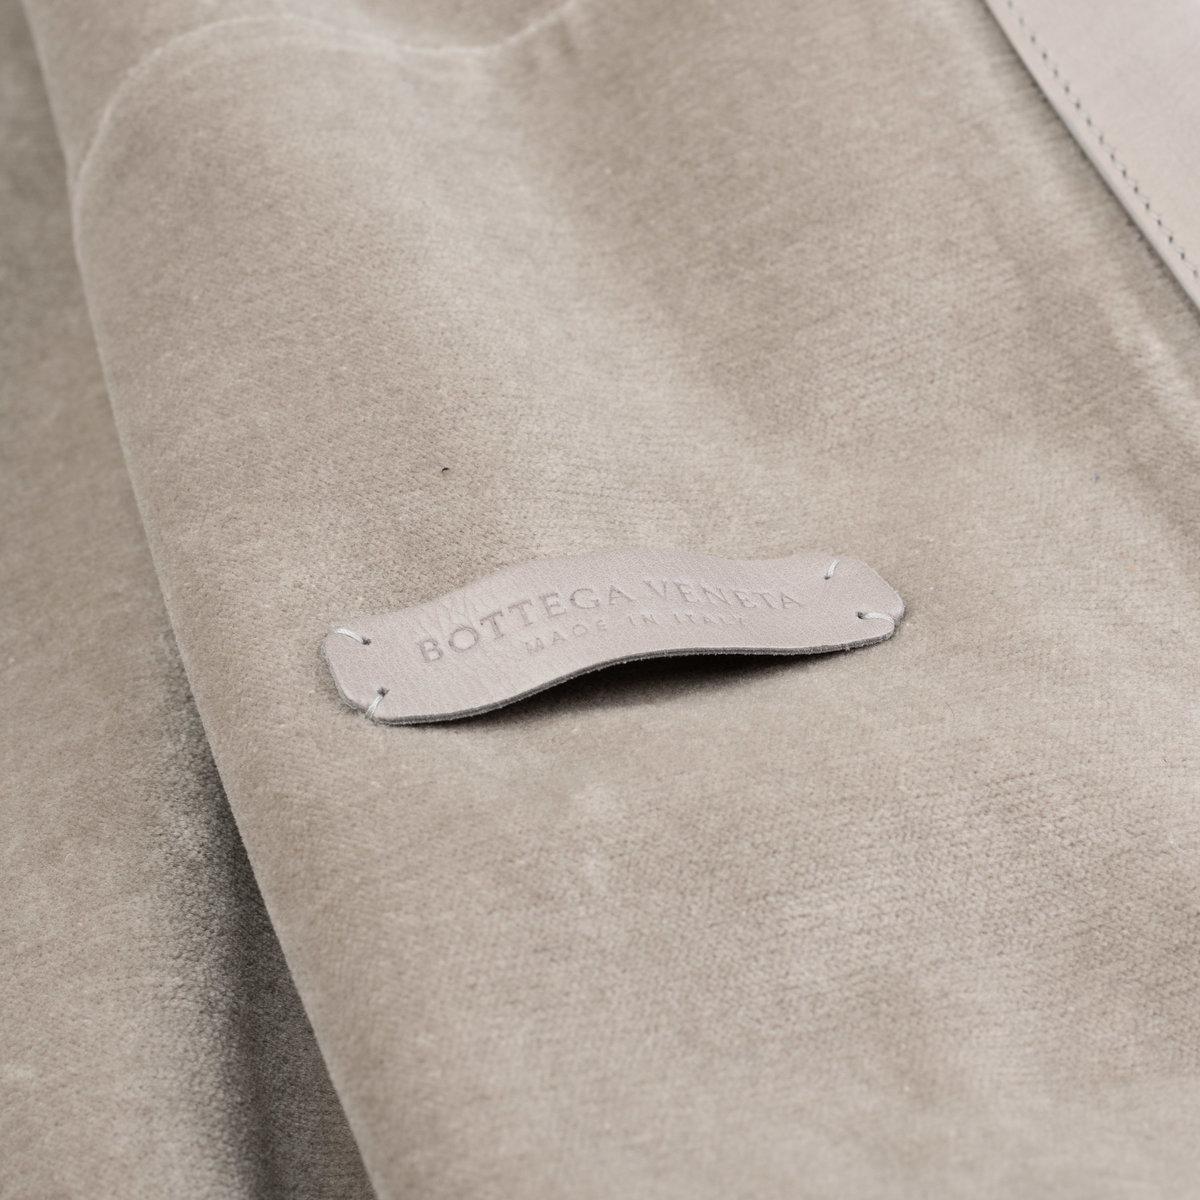 BOTTEGA VENETA Gray Taurus Leather Bomber Jacket with Velvet Cotton Lining 50 US M4.jpg